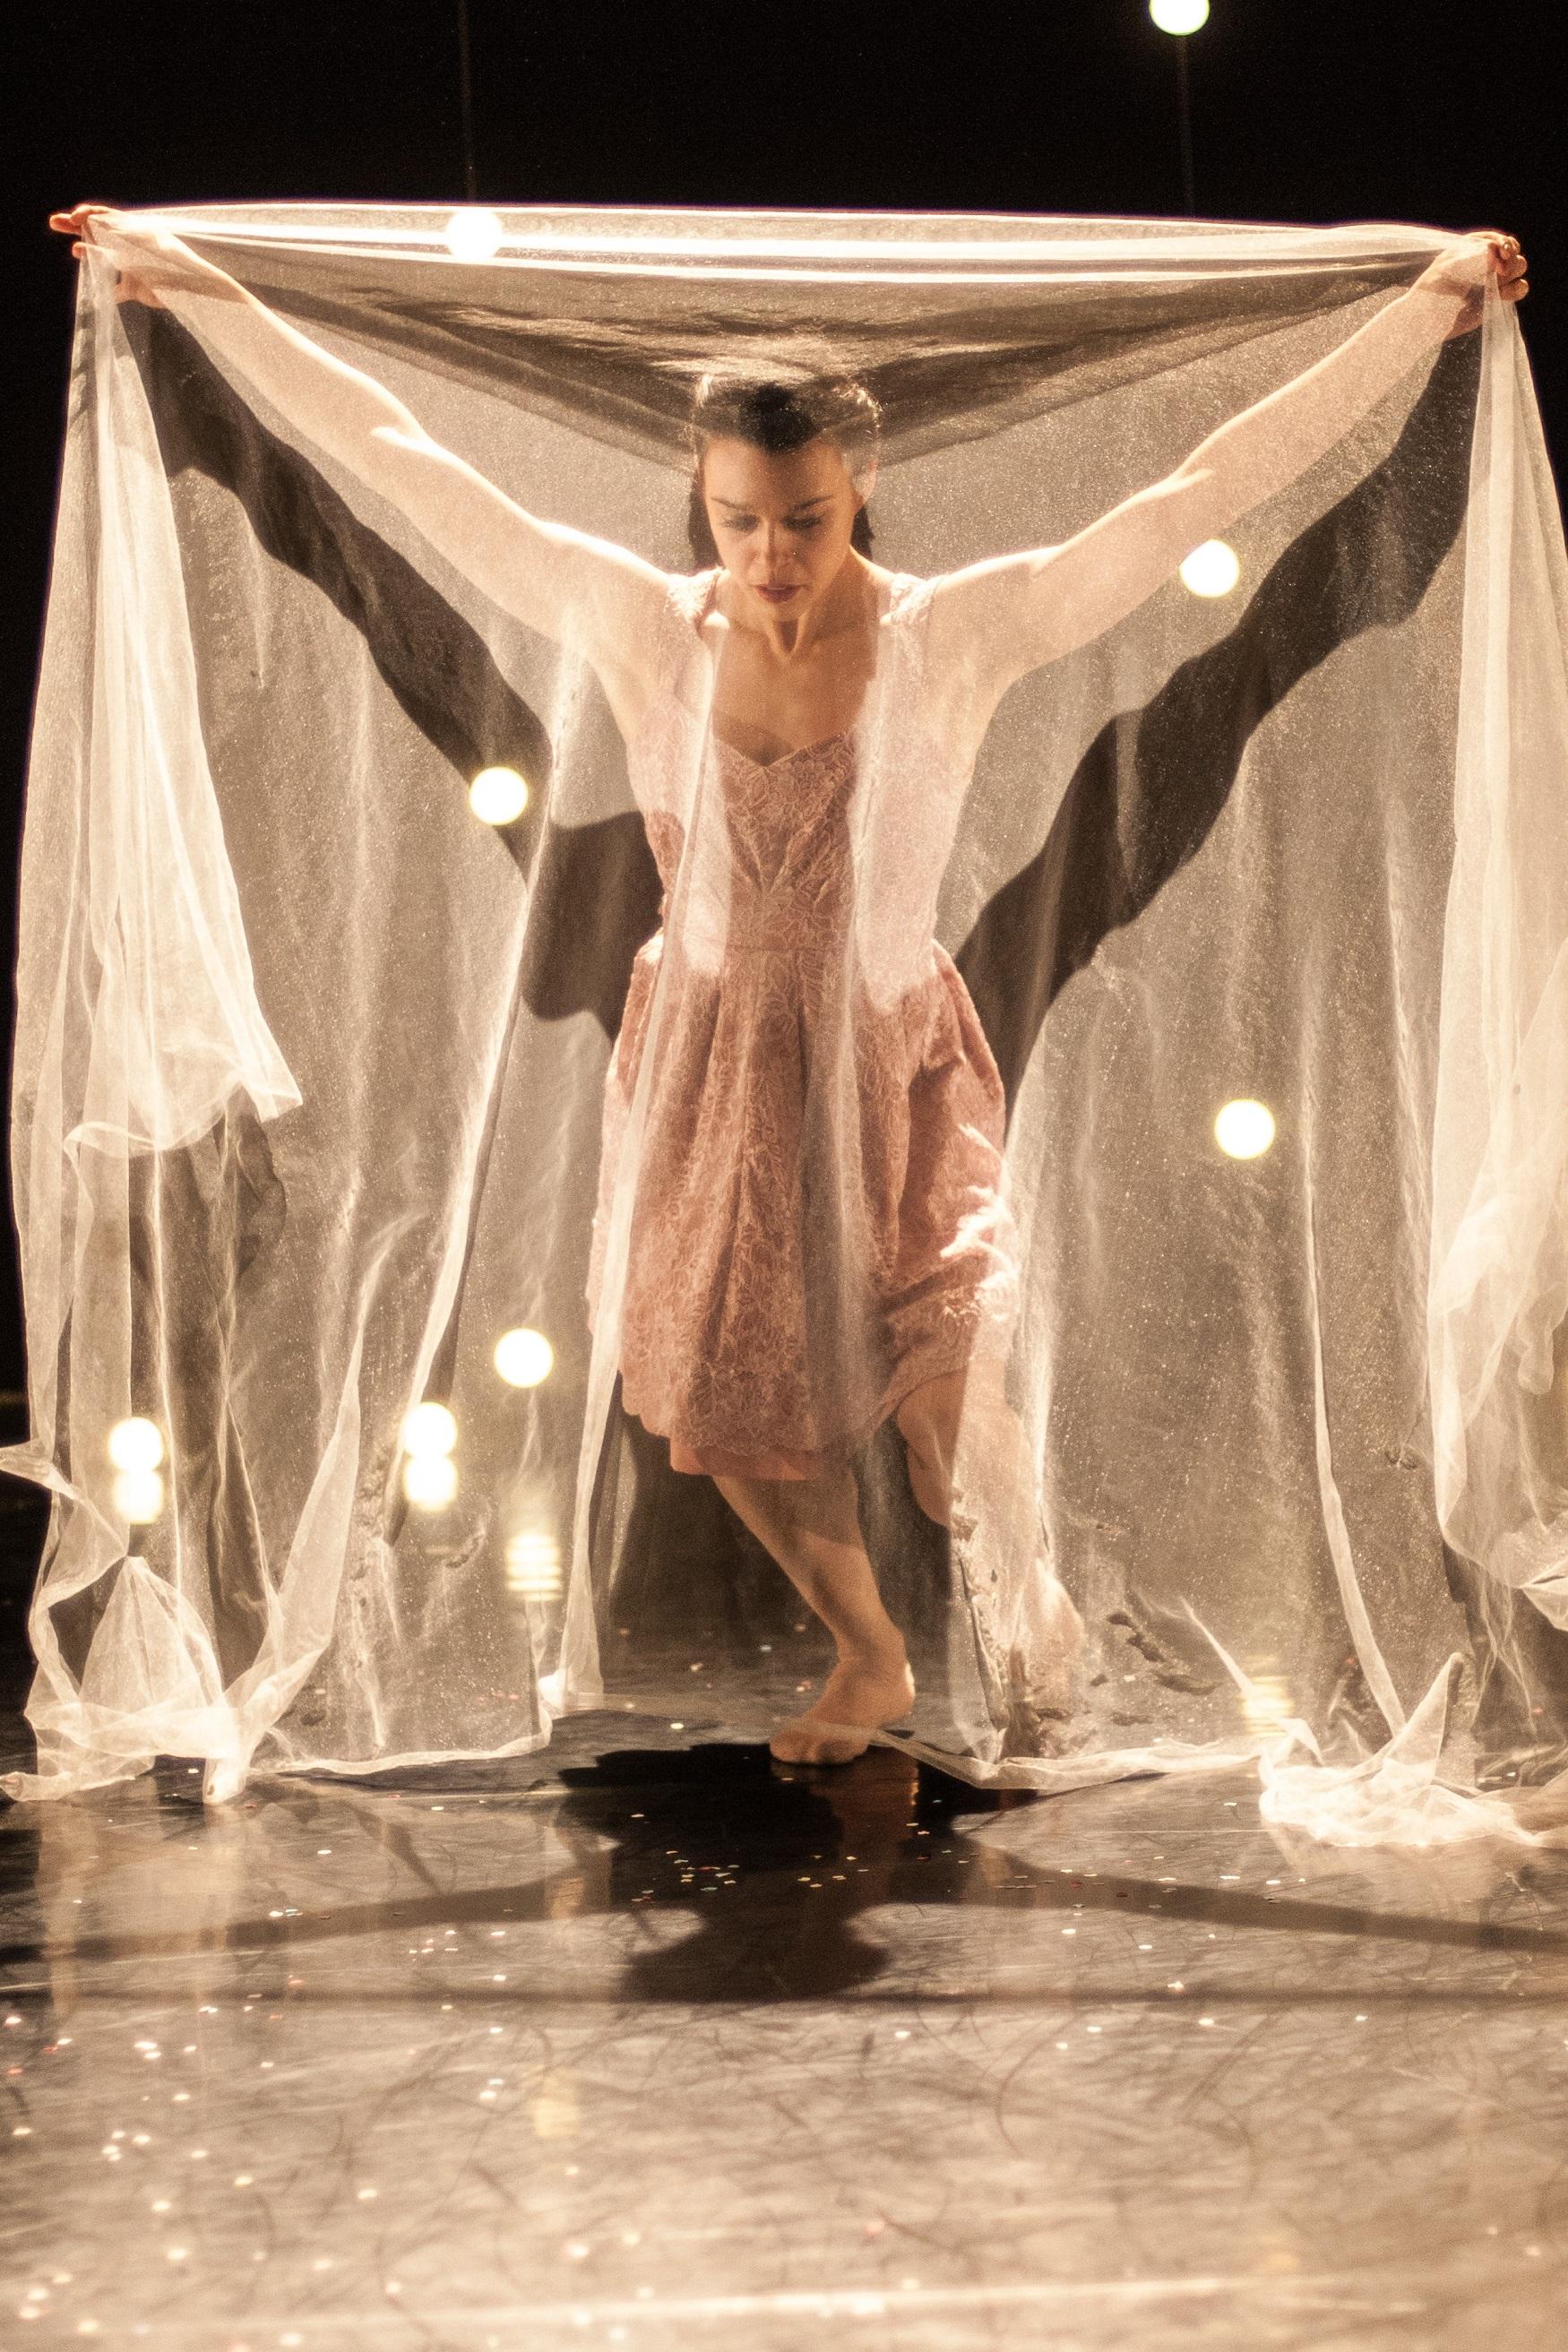 Umanoove in 'The Knot - dancer Sara Harton - photography Chris Nash.jpg